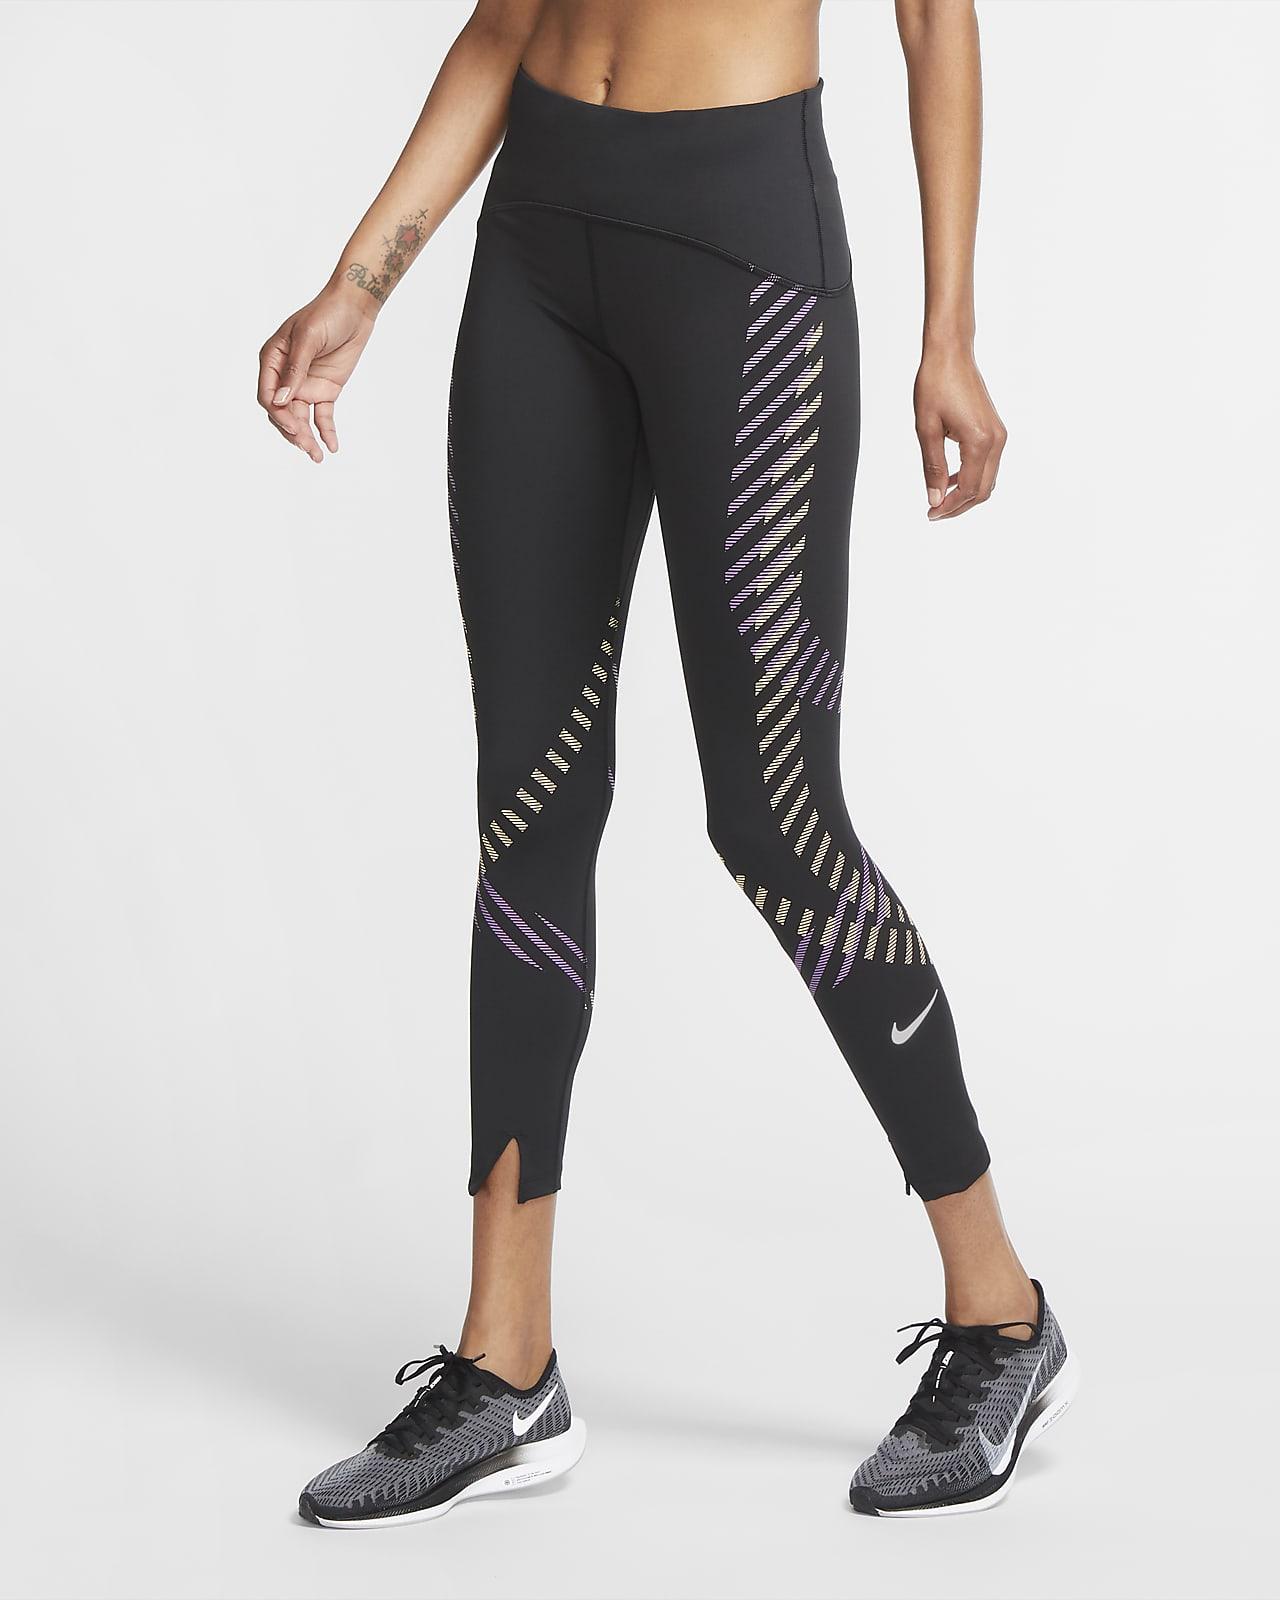 Nike Speed Women's Mid-Rise 7/8 Graphic Running Leggings